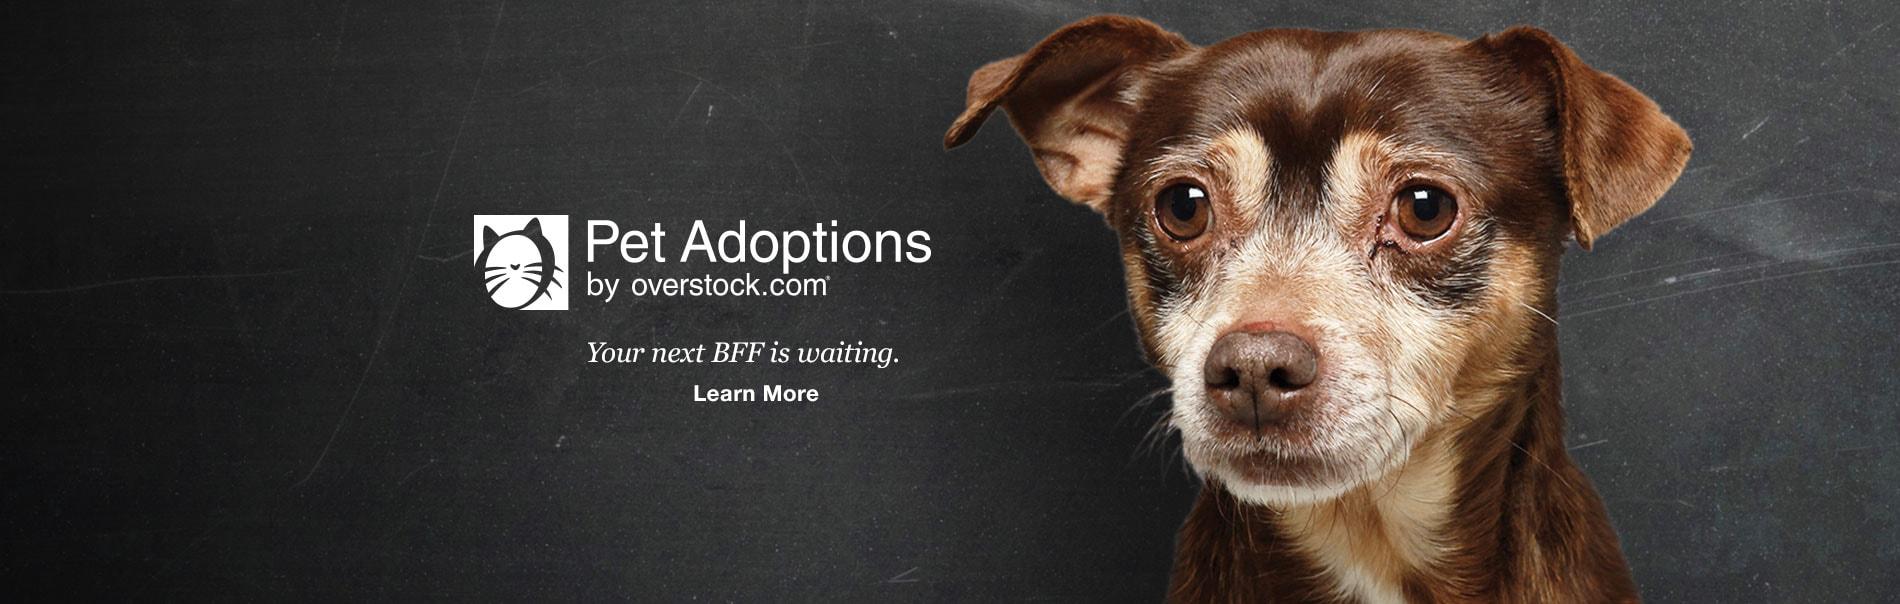 Overstock Pets